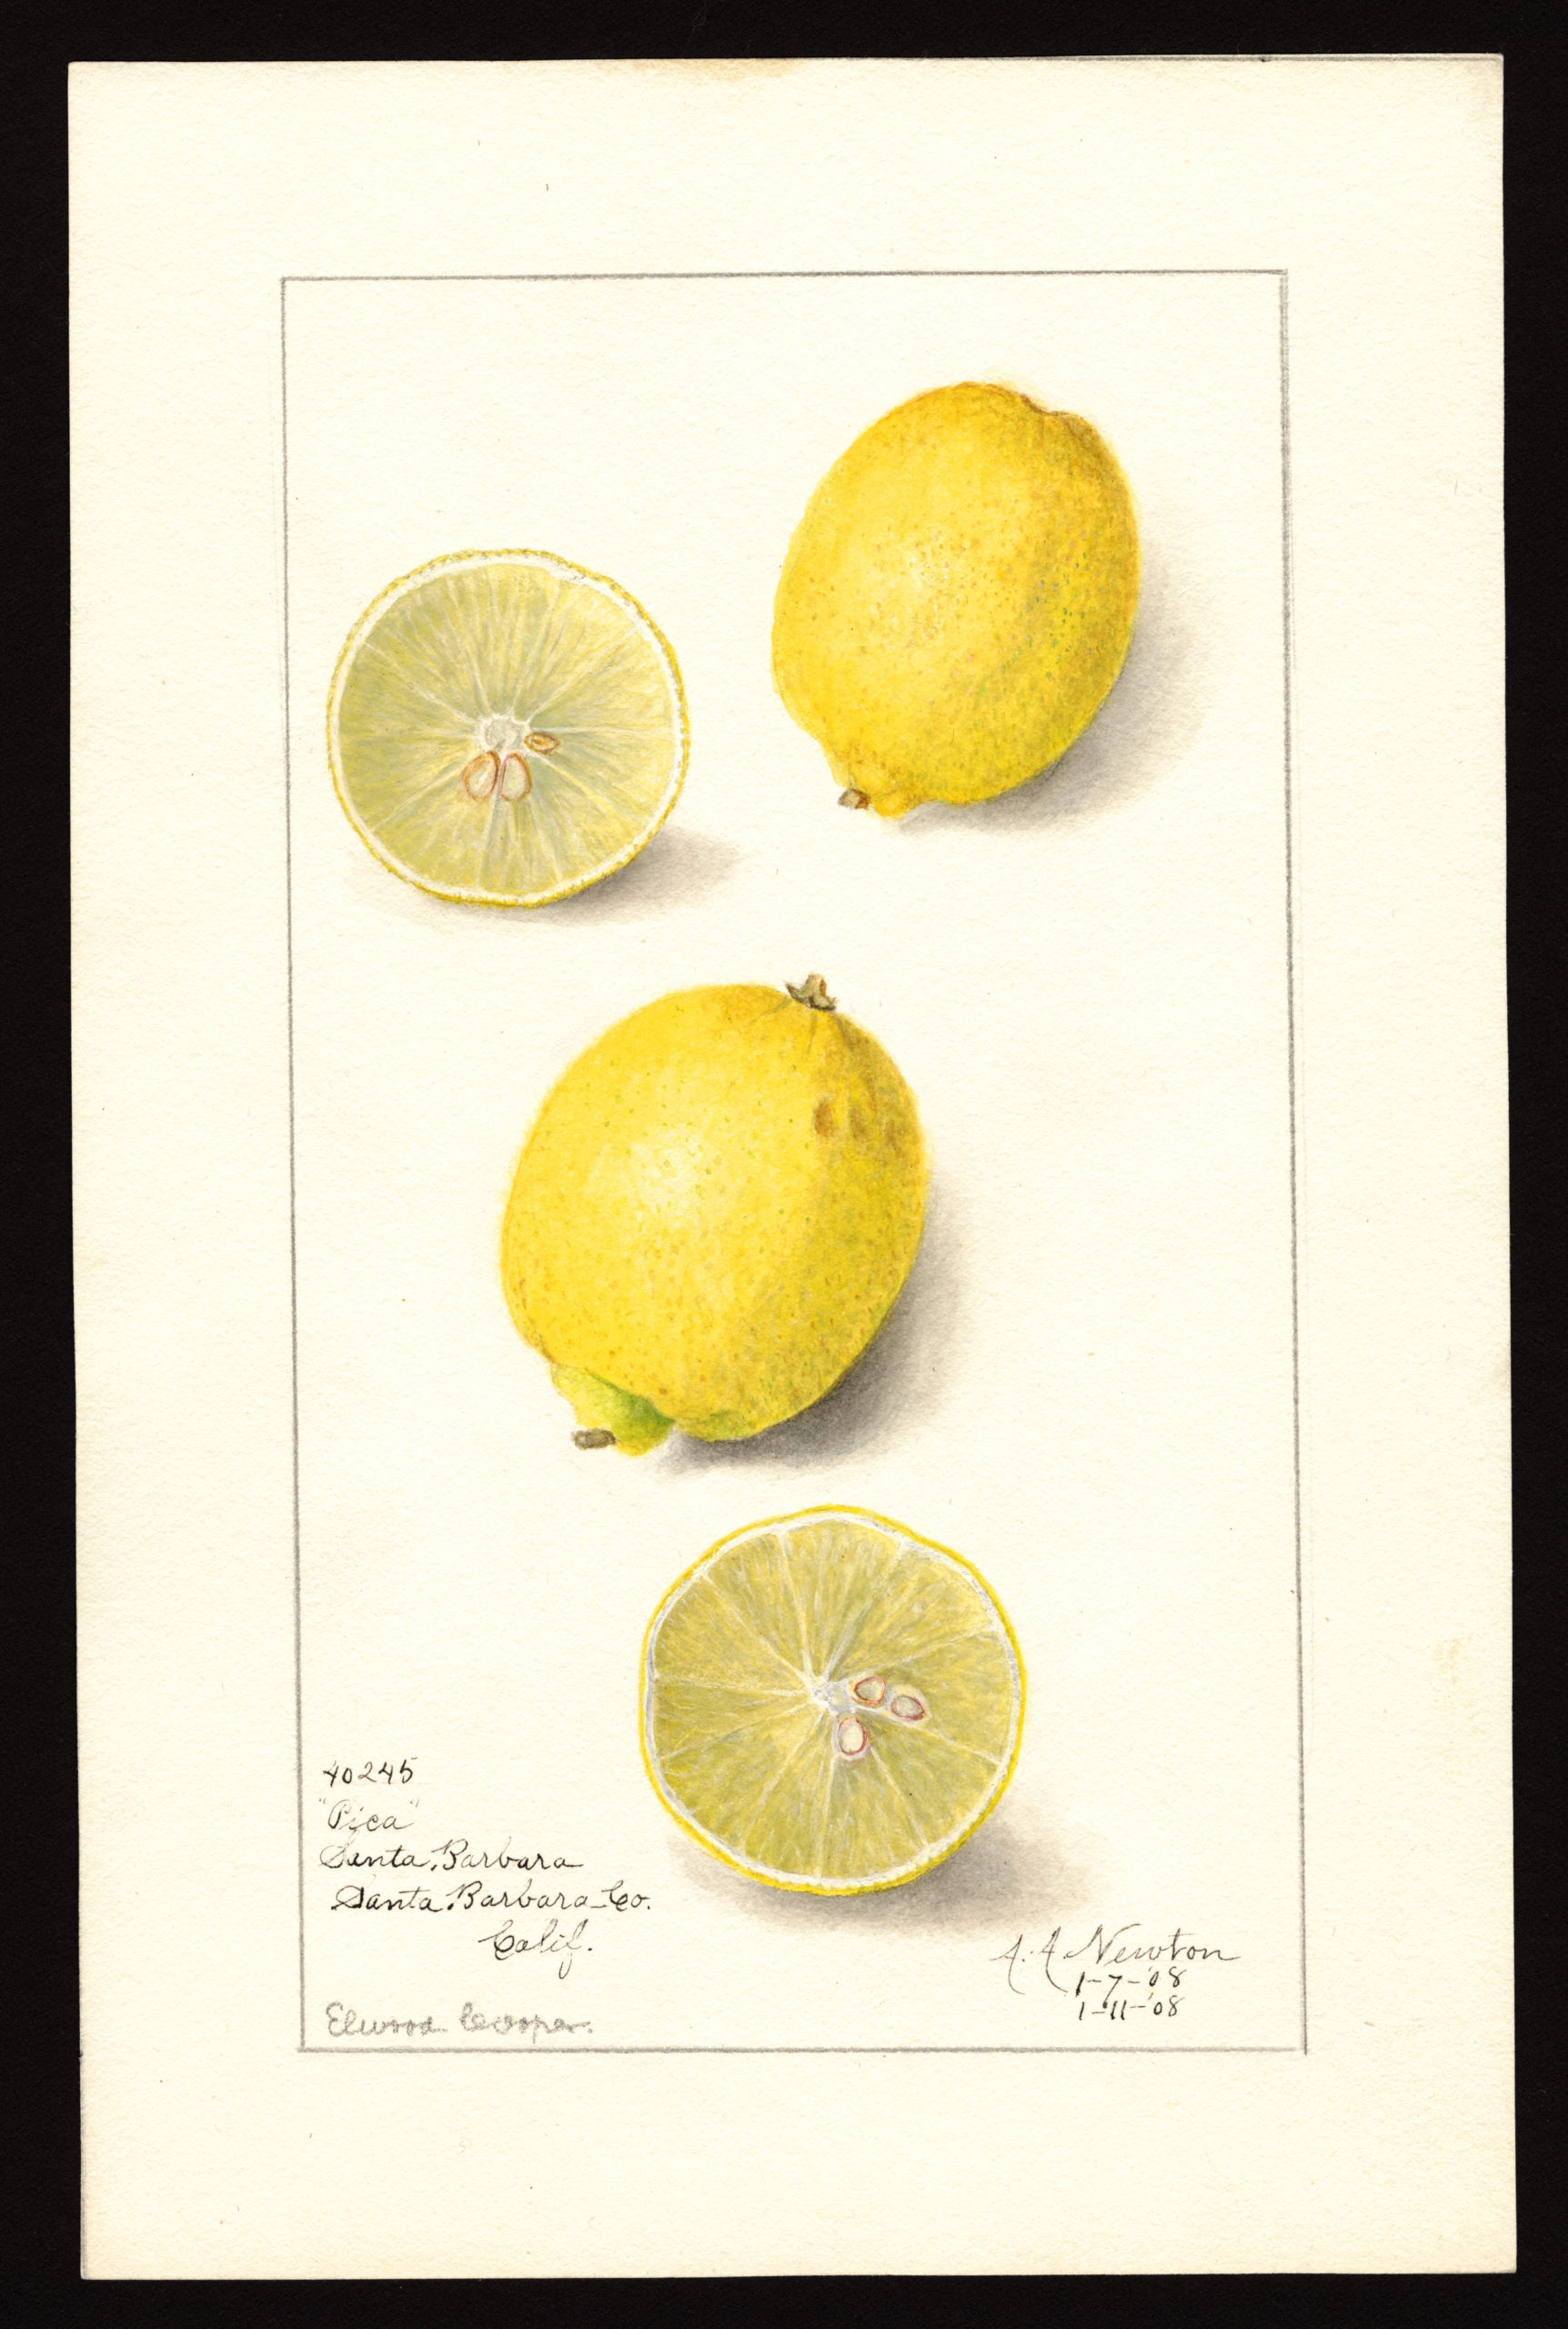 Pica variety of lemons